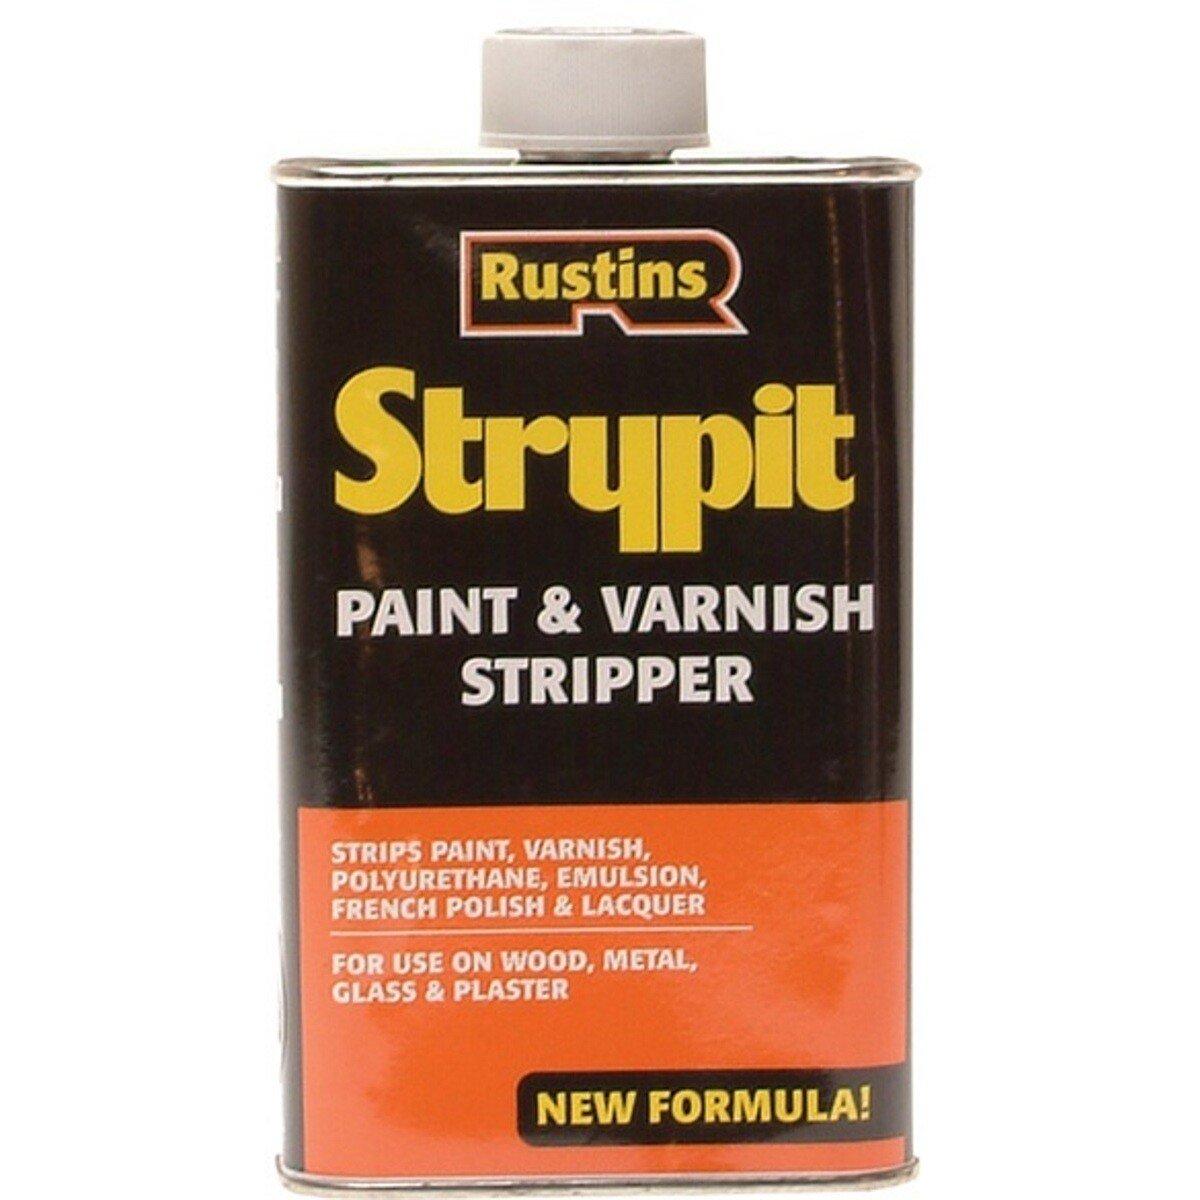 Rustins STNF1000 Strypit Paint & Varnish Stripper New Formulation 1ltr RUSNFS1L